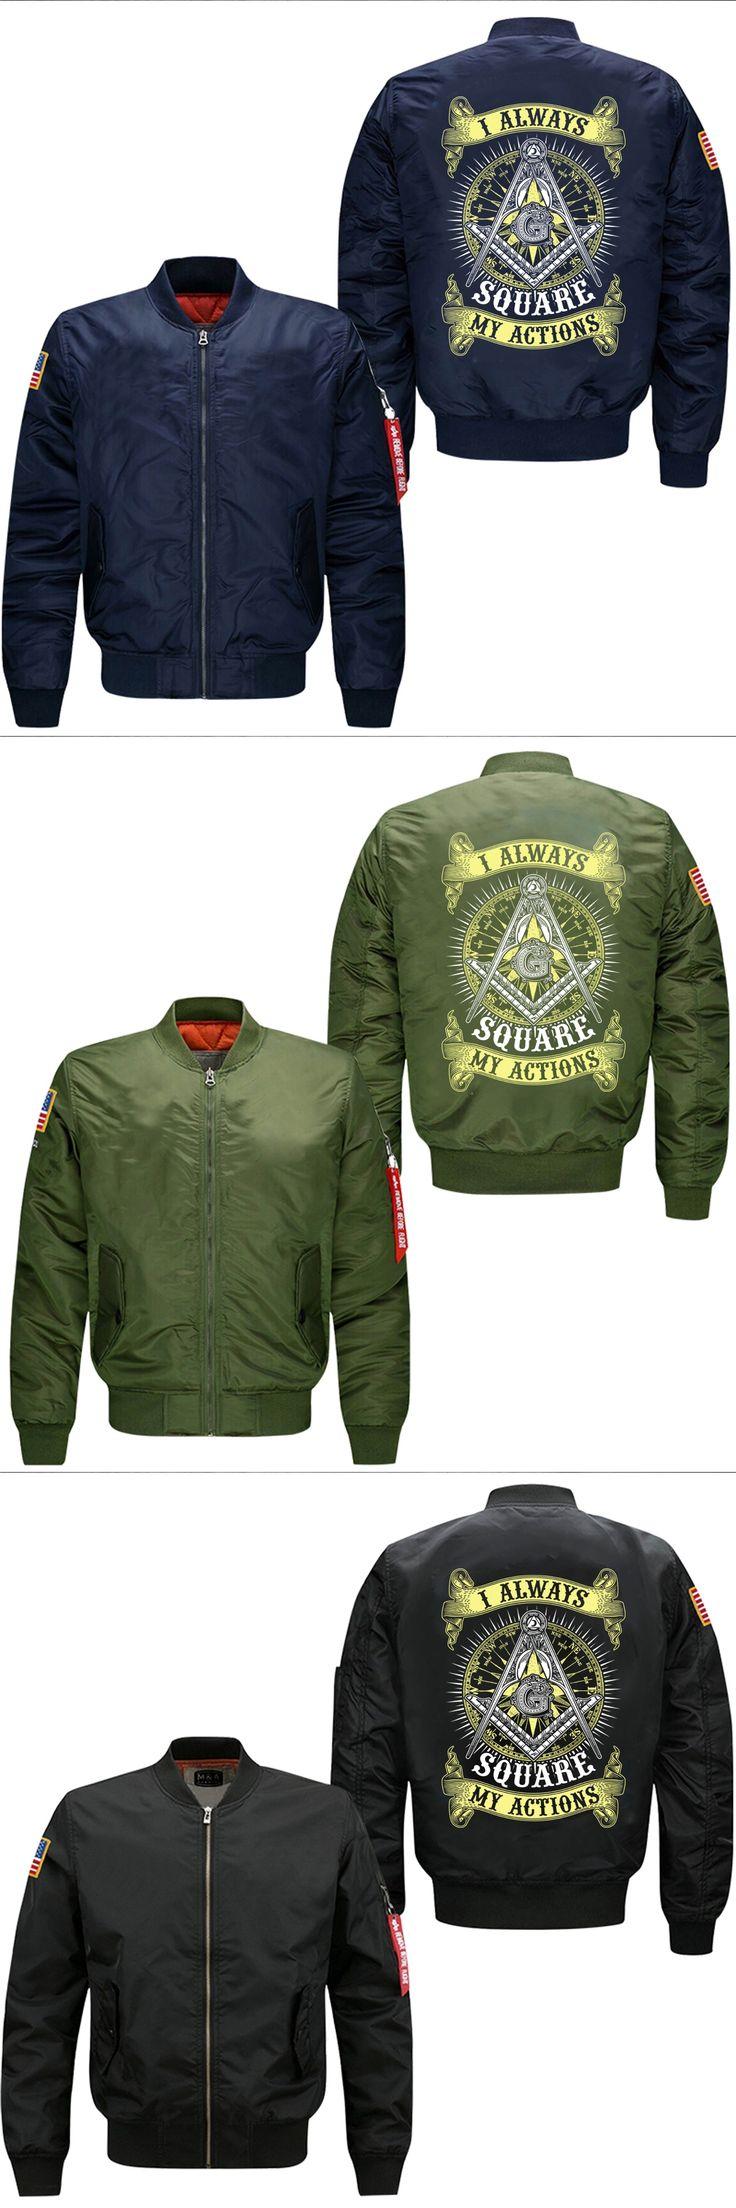 2017 spring men's flight jacket  i always aquare my actions leisure collar code Air Force pilots mans windbreaker jacket